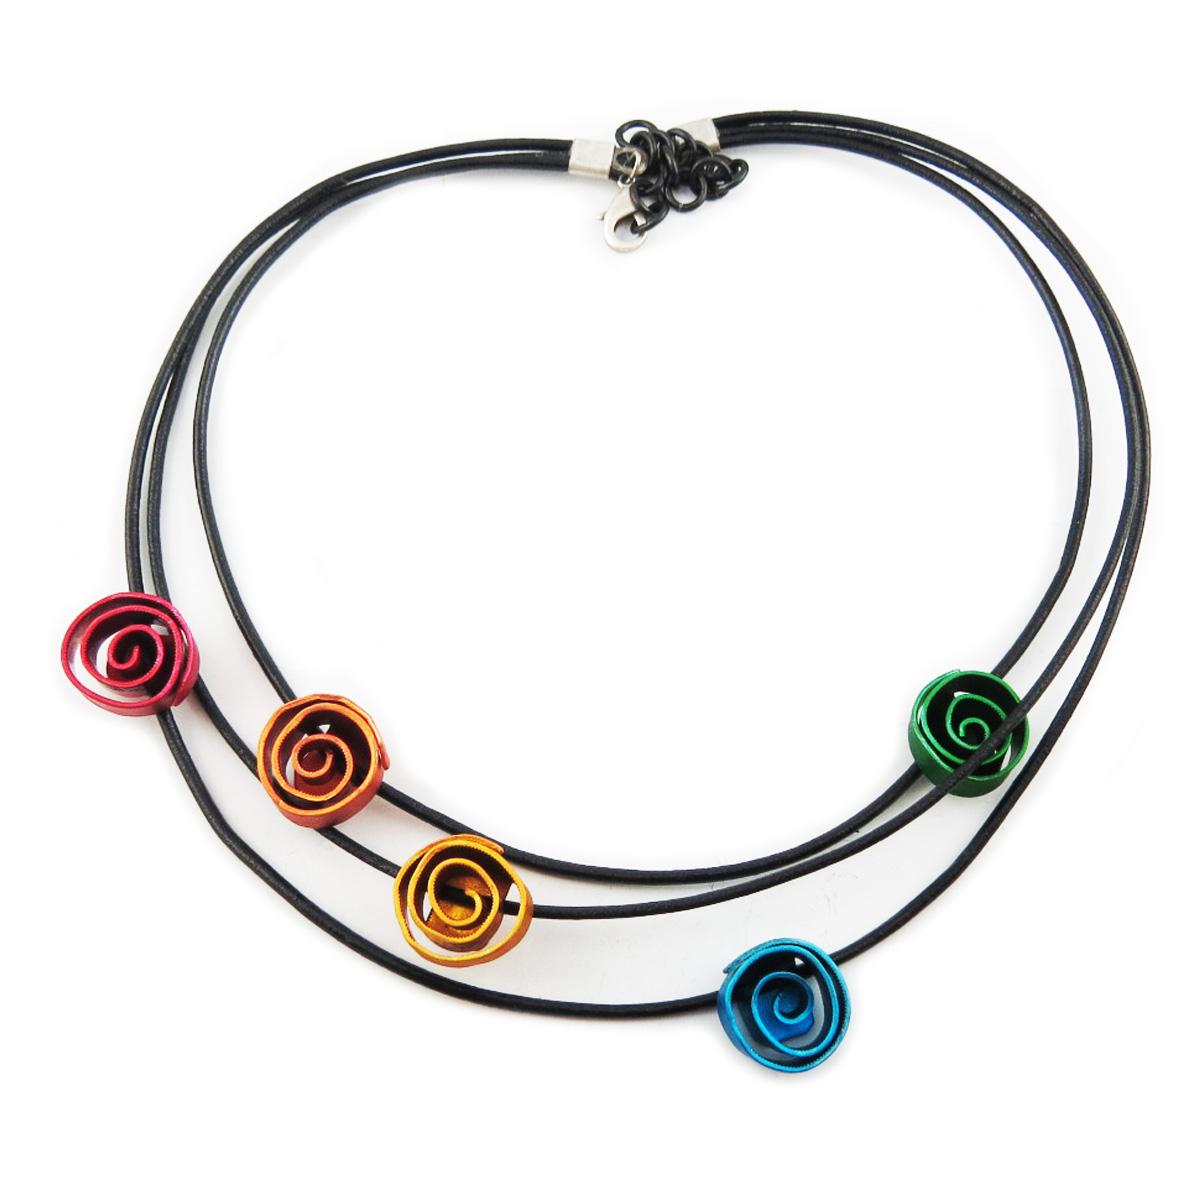 Collier artisanal \'Aluminirock\' multicolore (3 rangs) - fleurs 15 cm - [R1256]